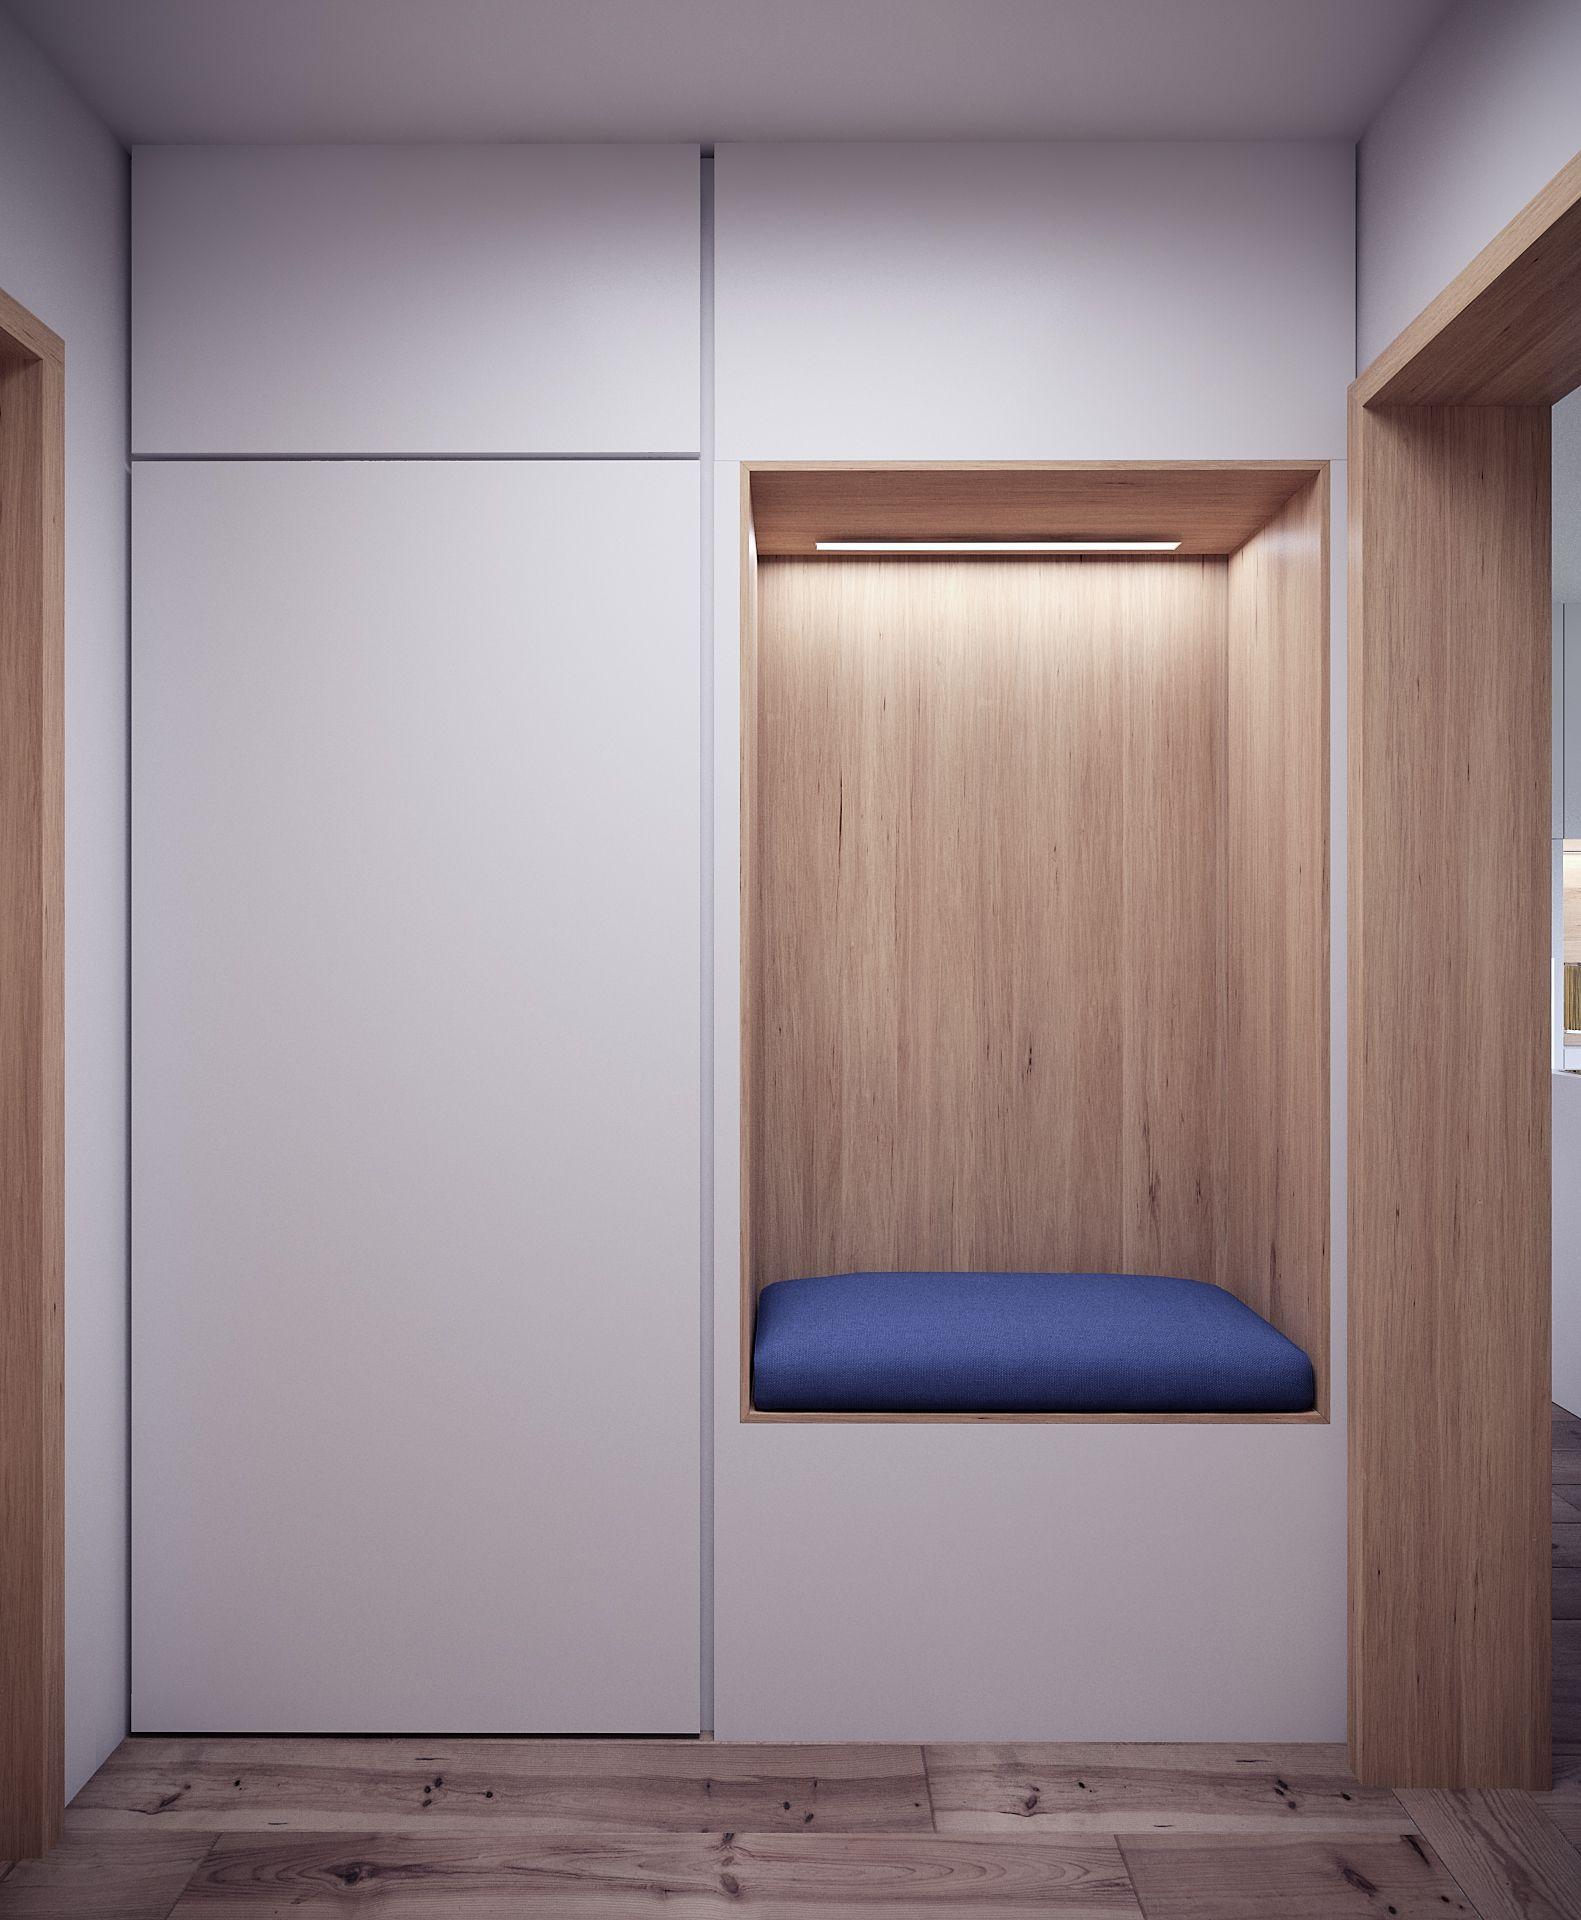 PF3074 – Entrance hall furniture